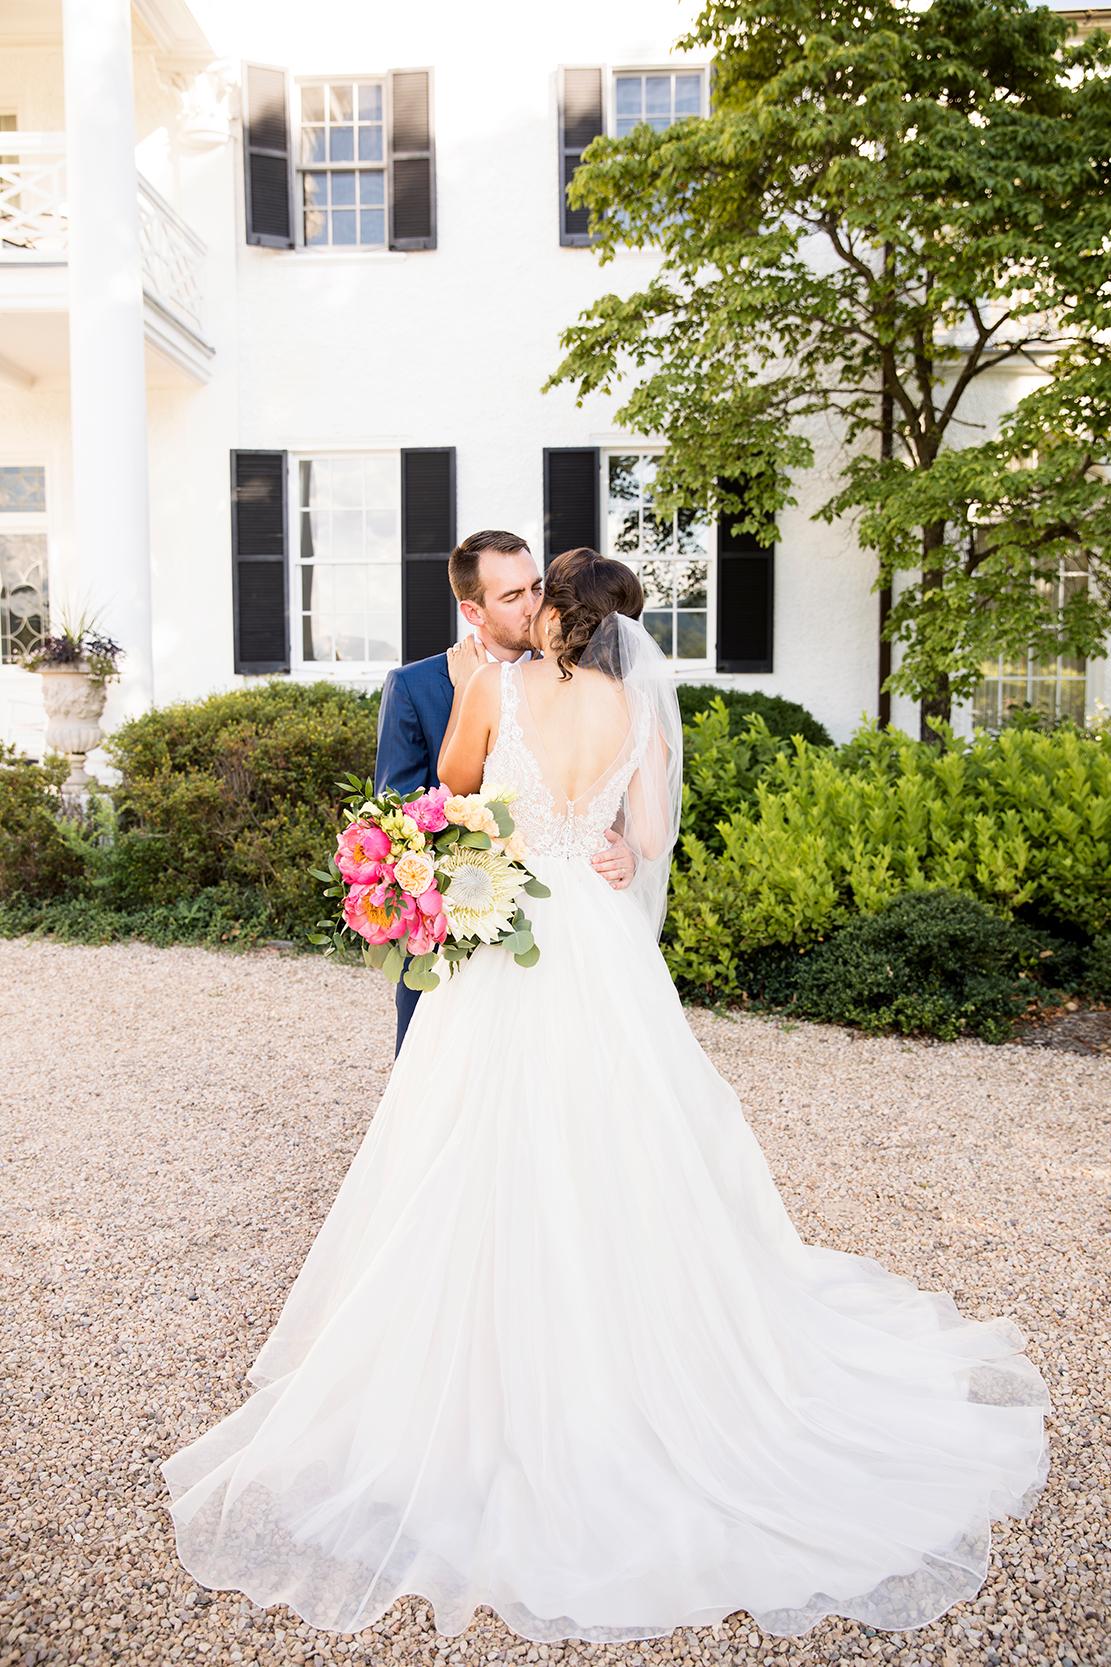 Ann Smith and Ben Harris's Wedding Website - theknot.com